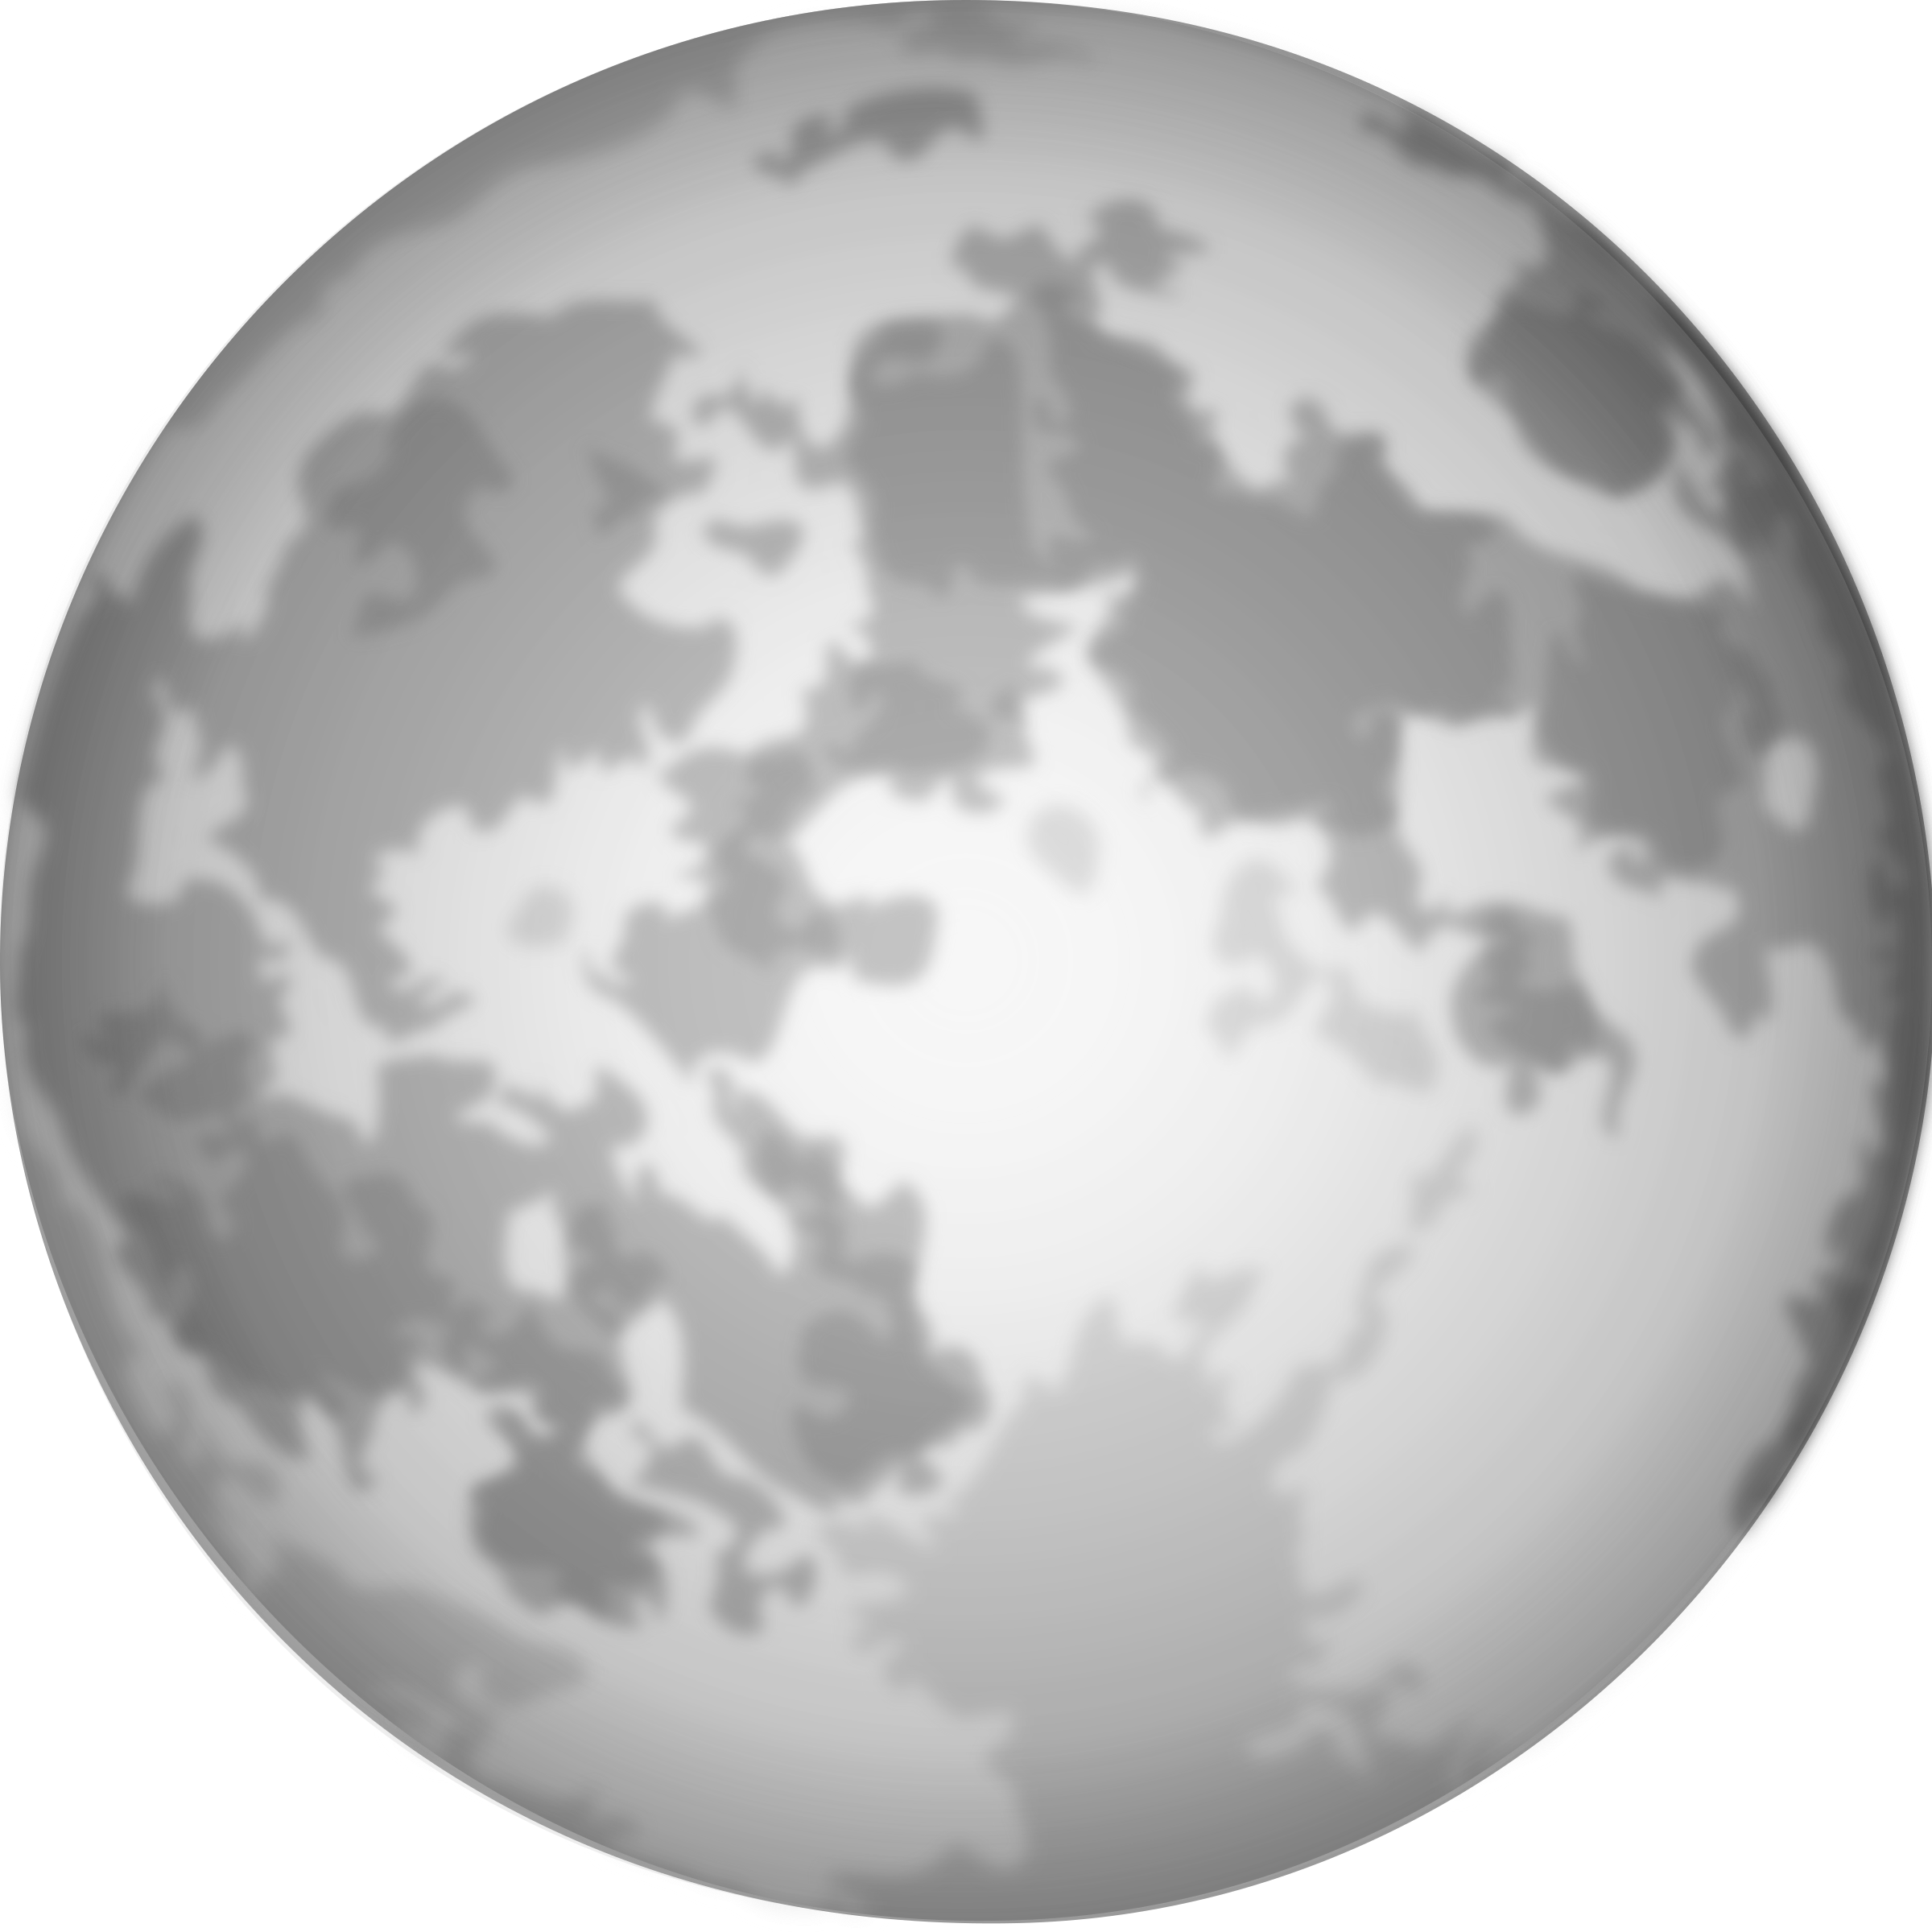 Moon Transparent Clipart Halloween Brigh-Moon Transparent Clipart Halloween Bright Full Moon-4